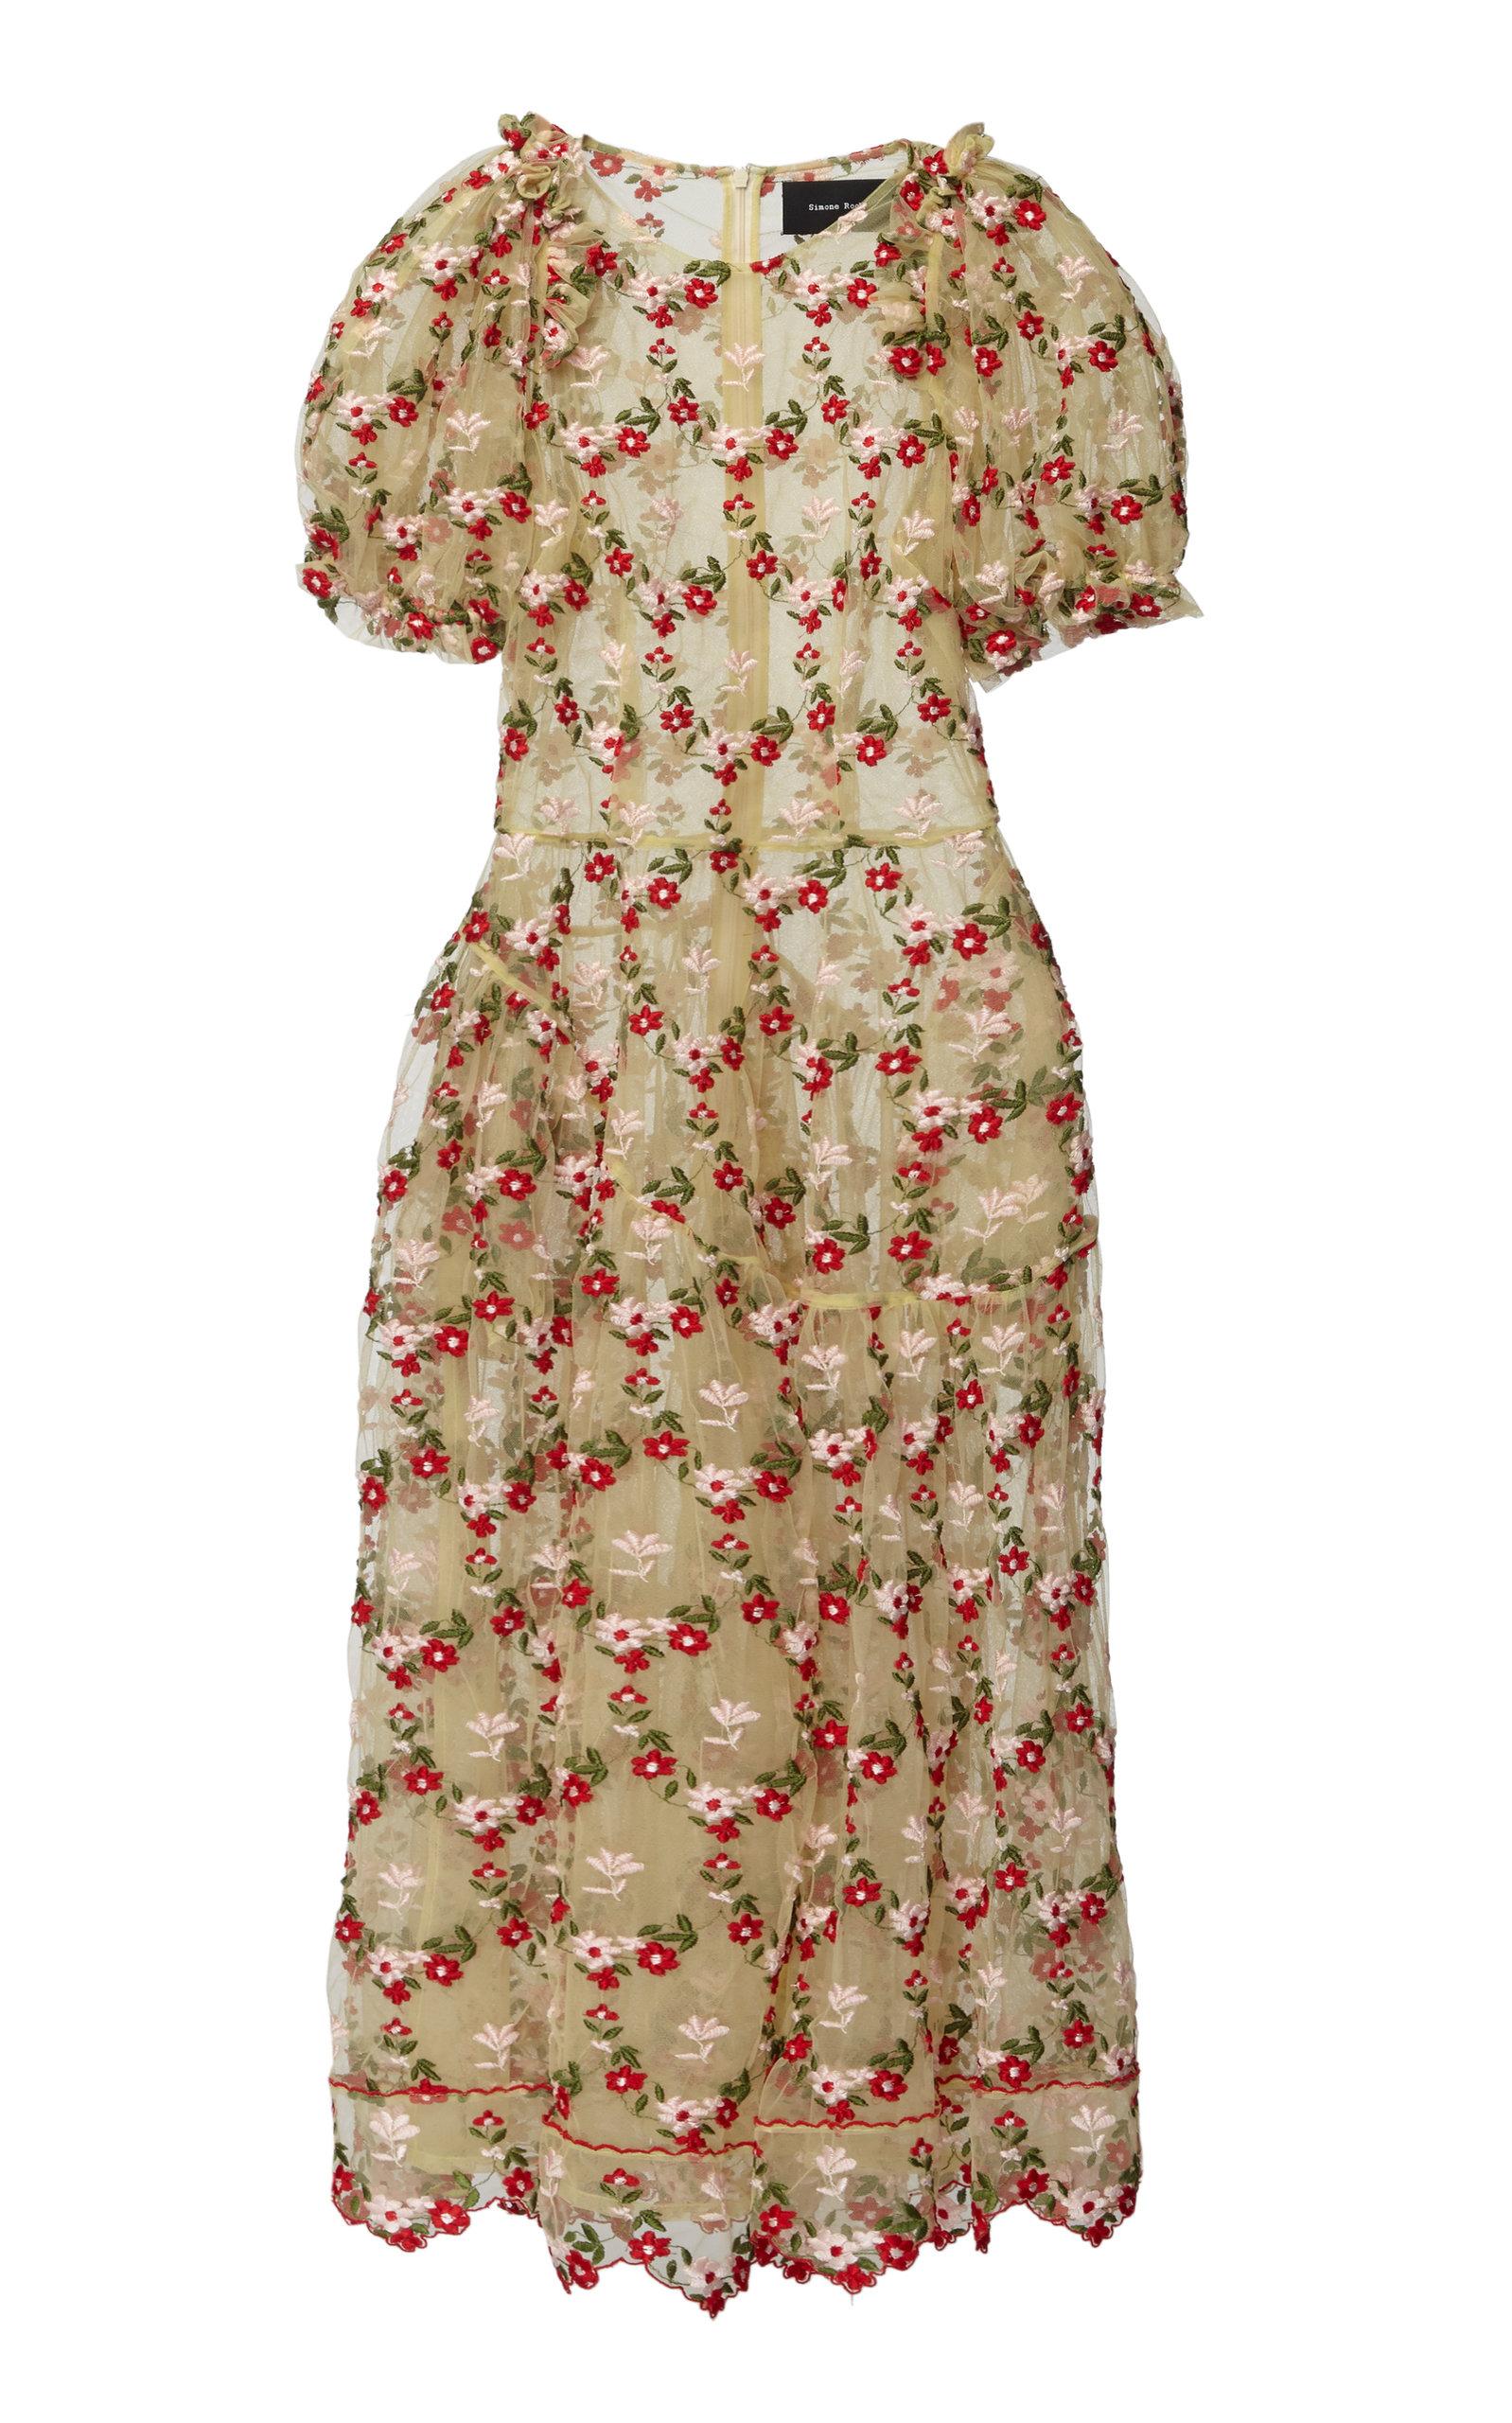 8b0ac86dbbe0e4 Simone RochaLace Tulle Full Midi Dress. CLOSE. Loading